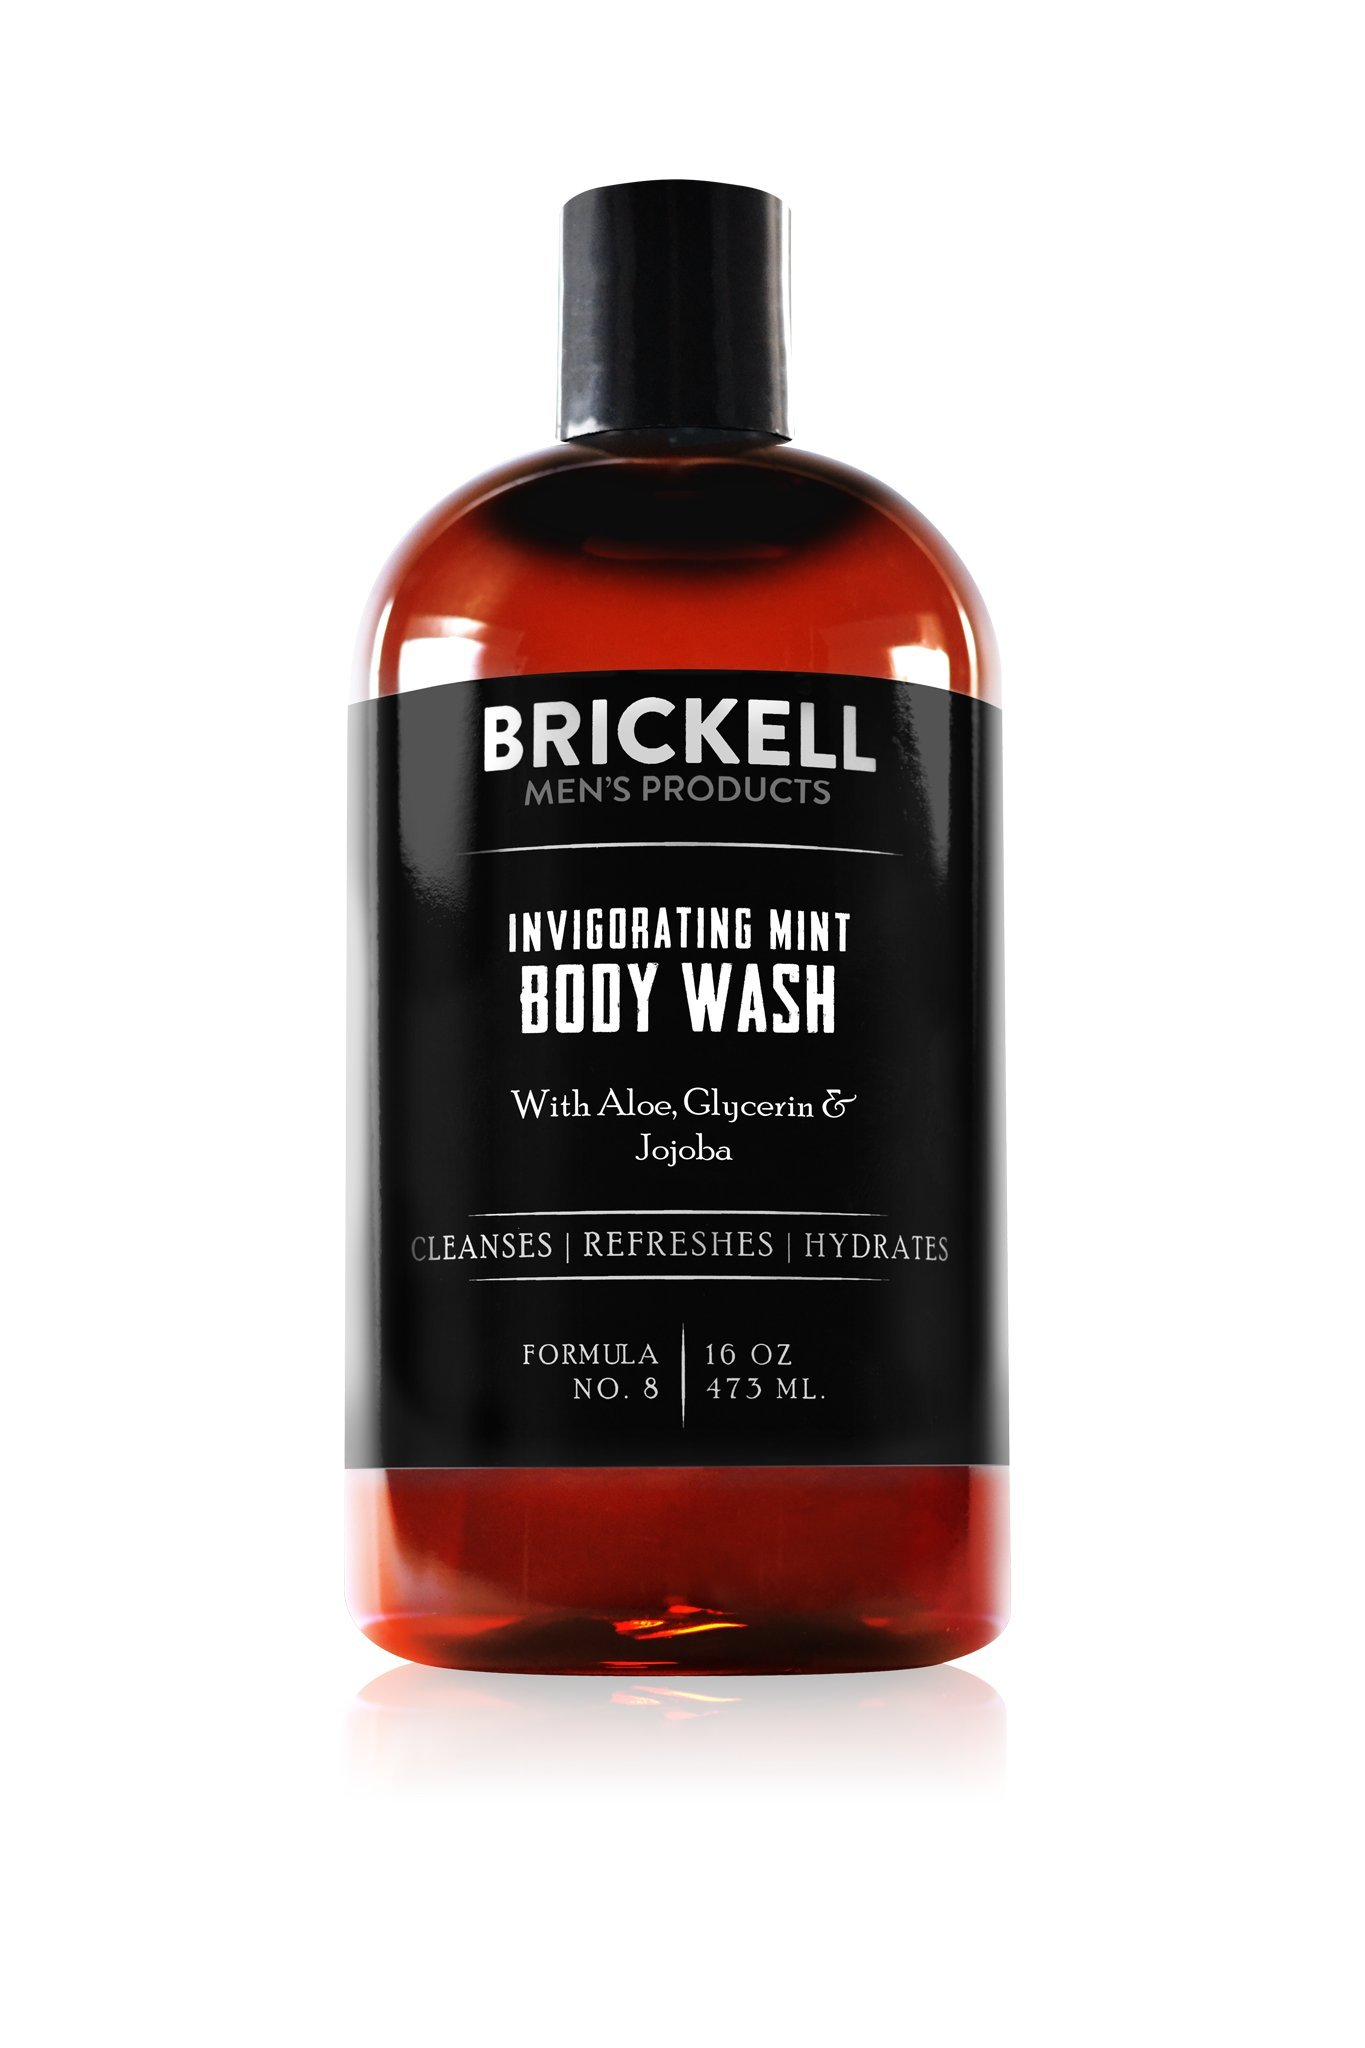 Brickell Men's Invigorating Mint Body Wash for Men – 16 oz – Natural & Organic